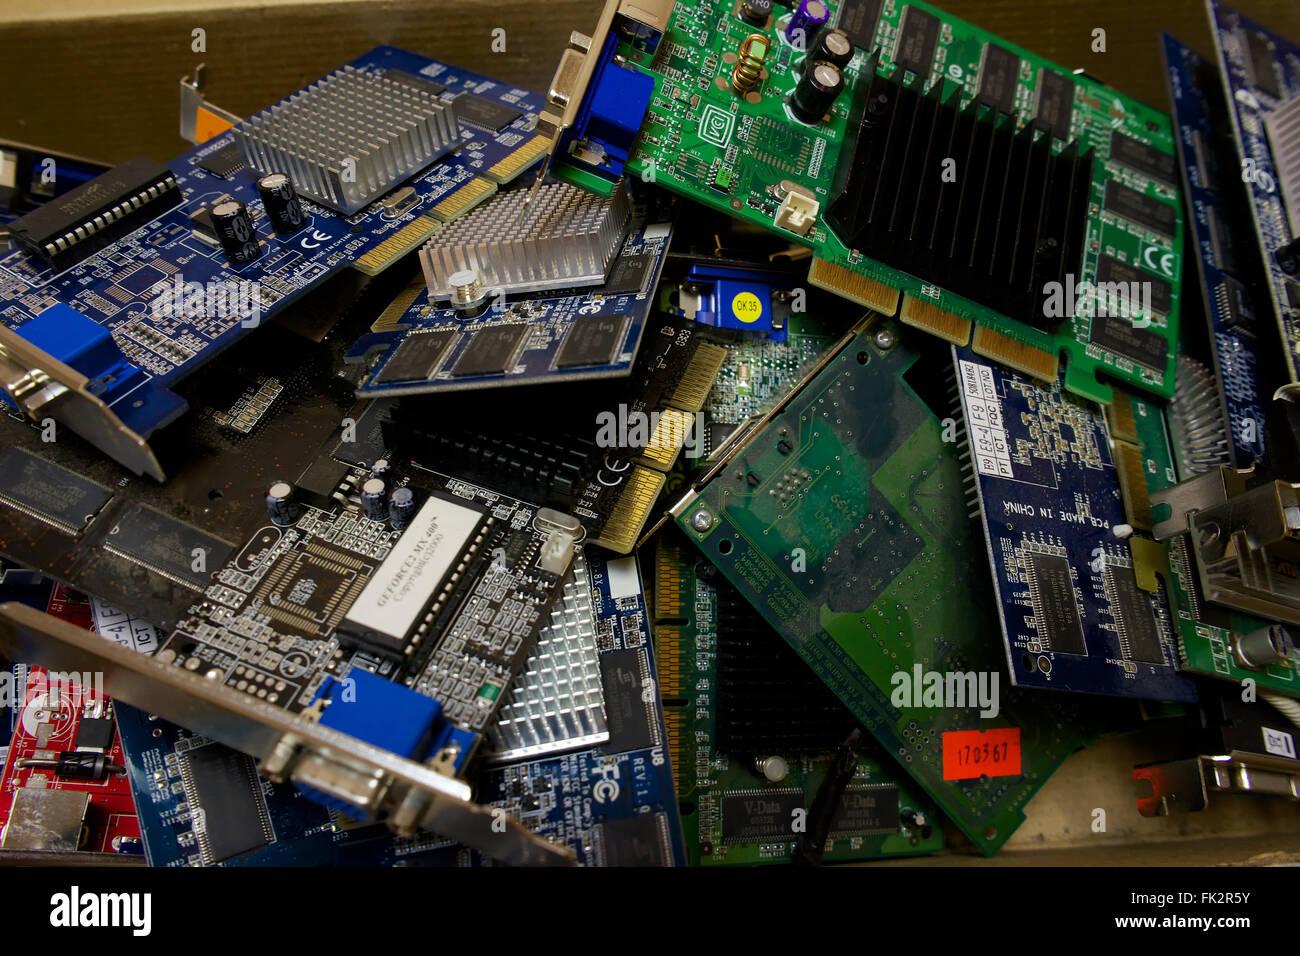 Landfill computer components. Broken equipment. - Stock Image